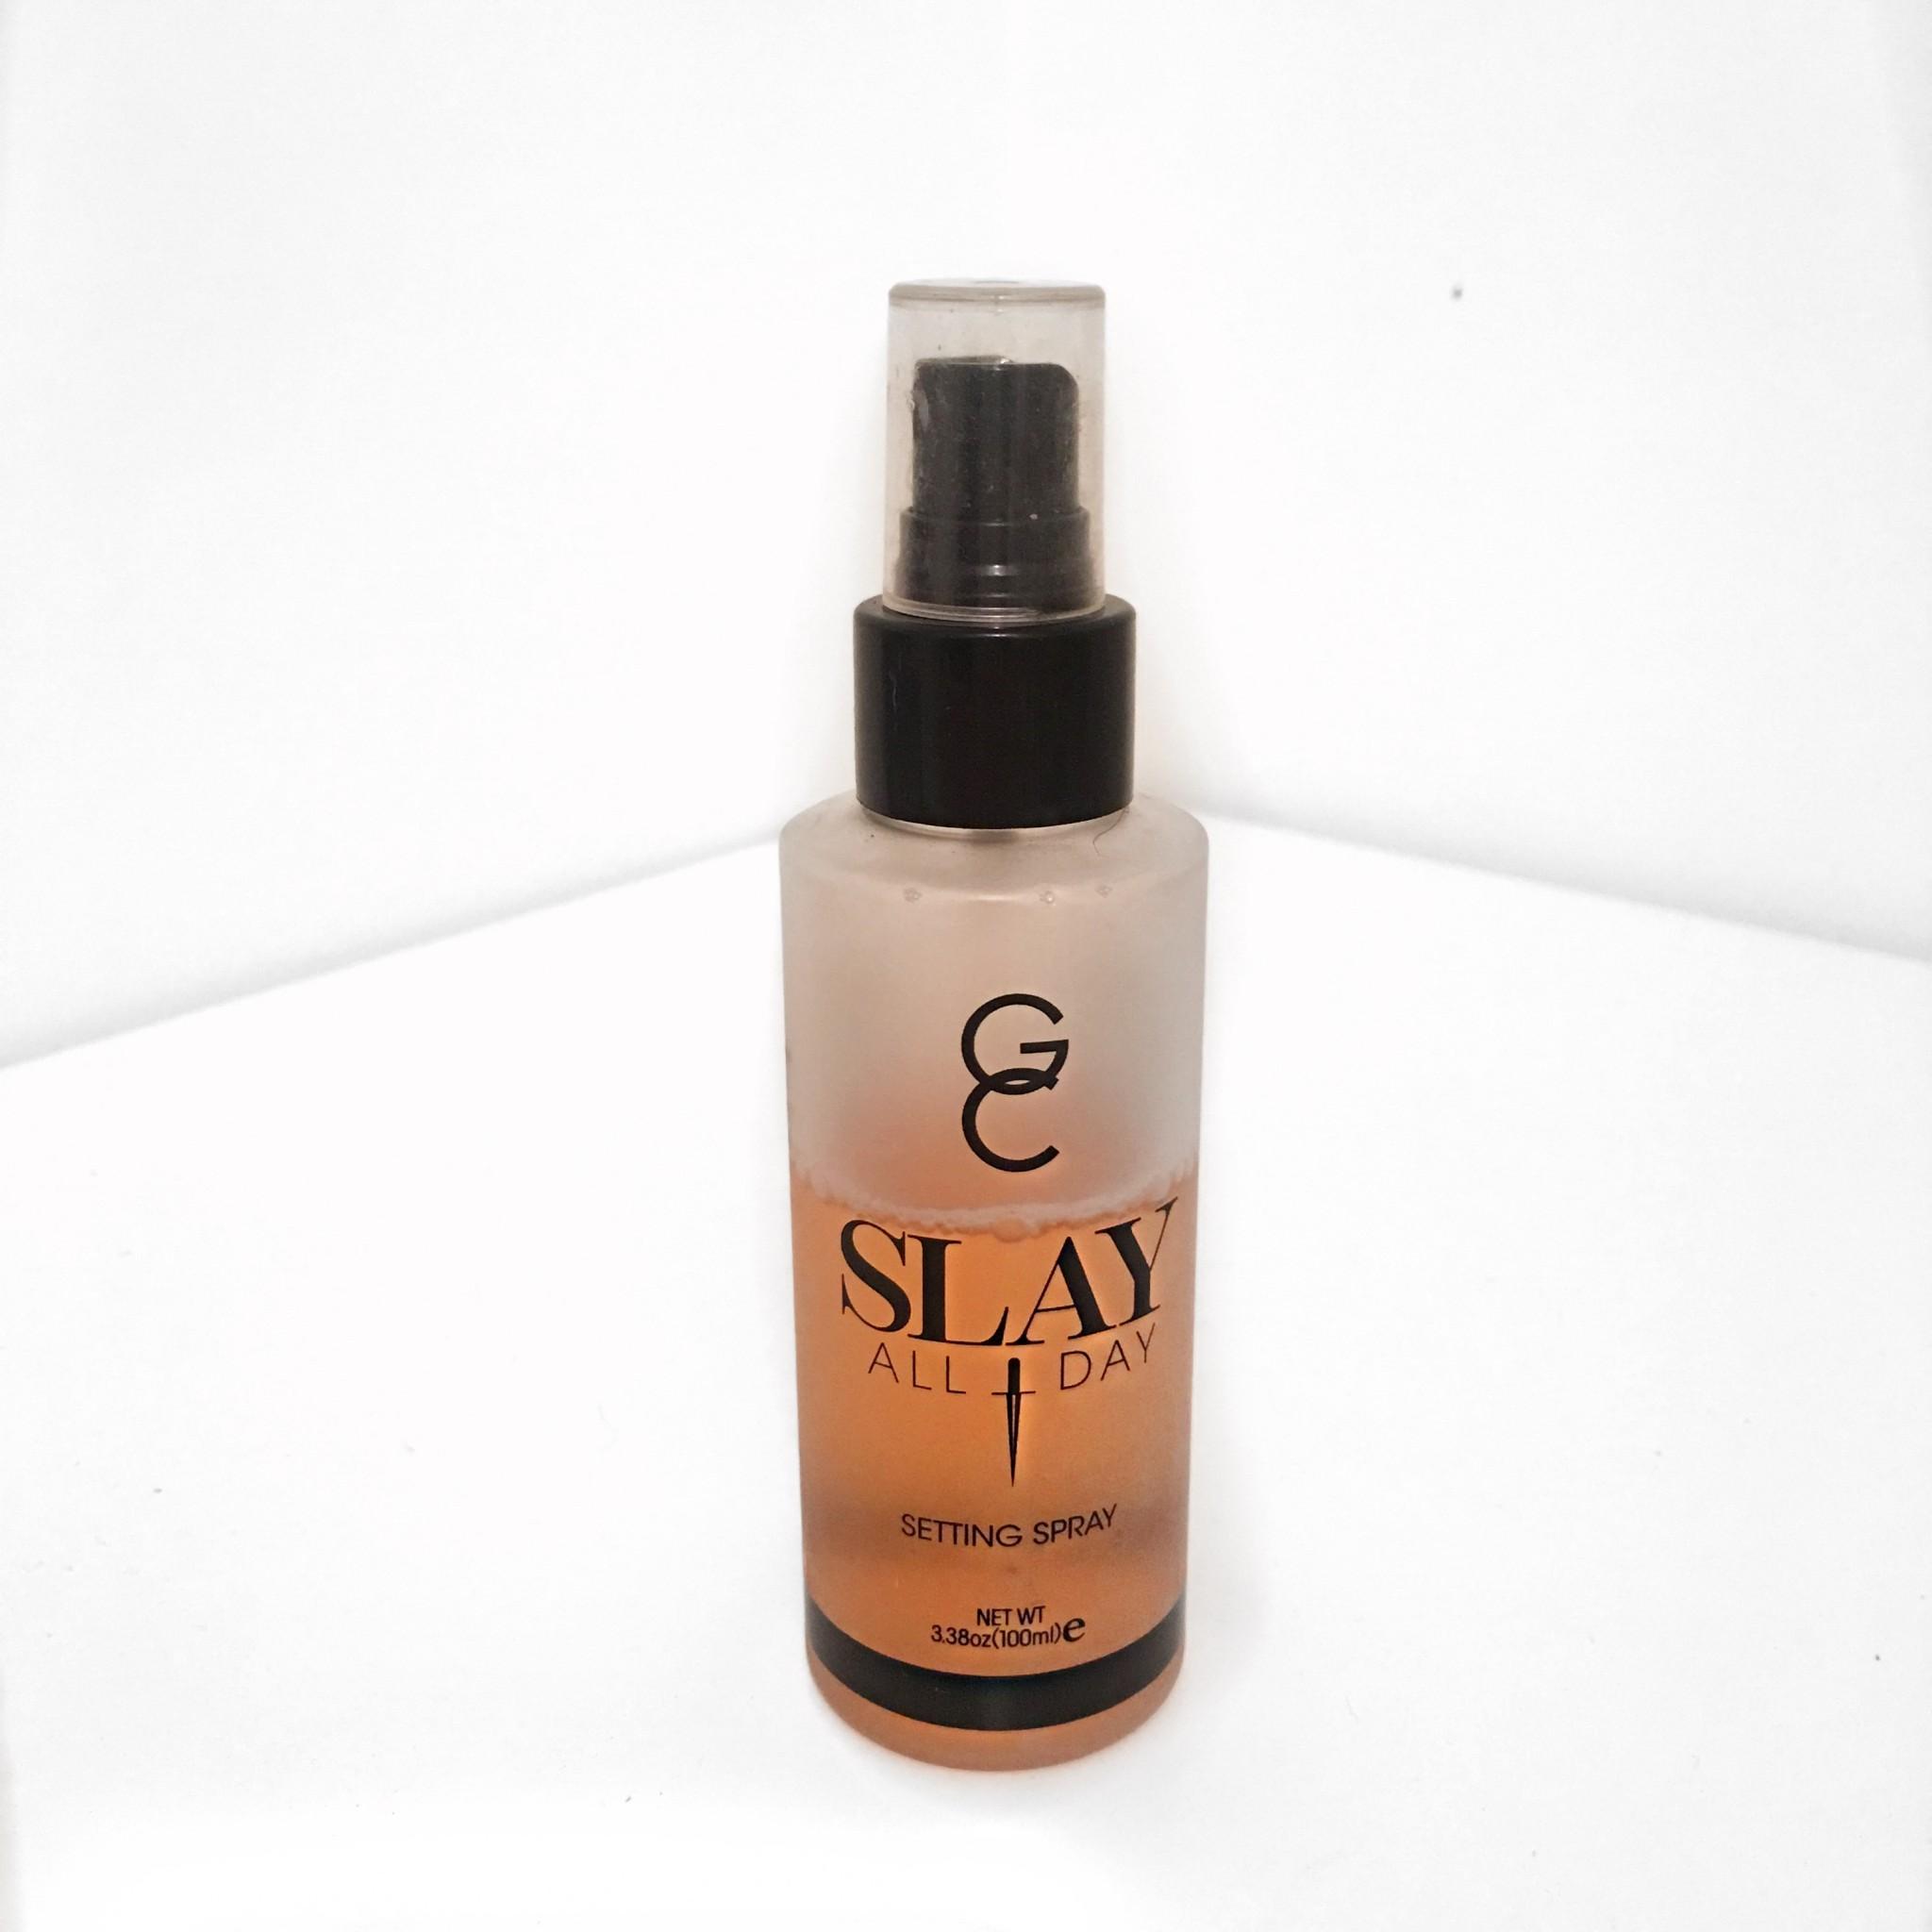 slay setting spray review